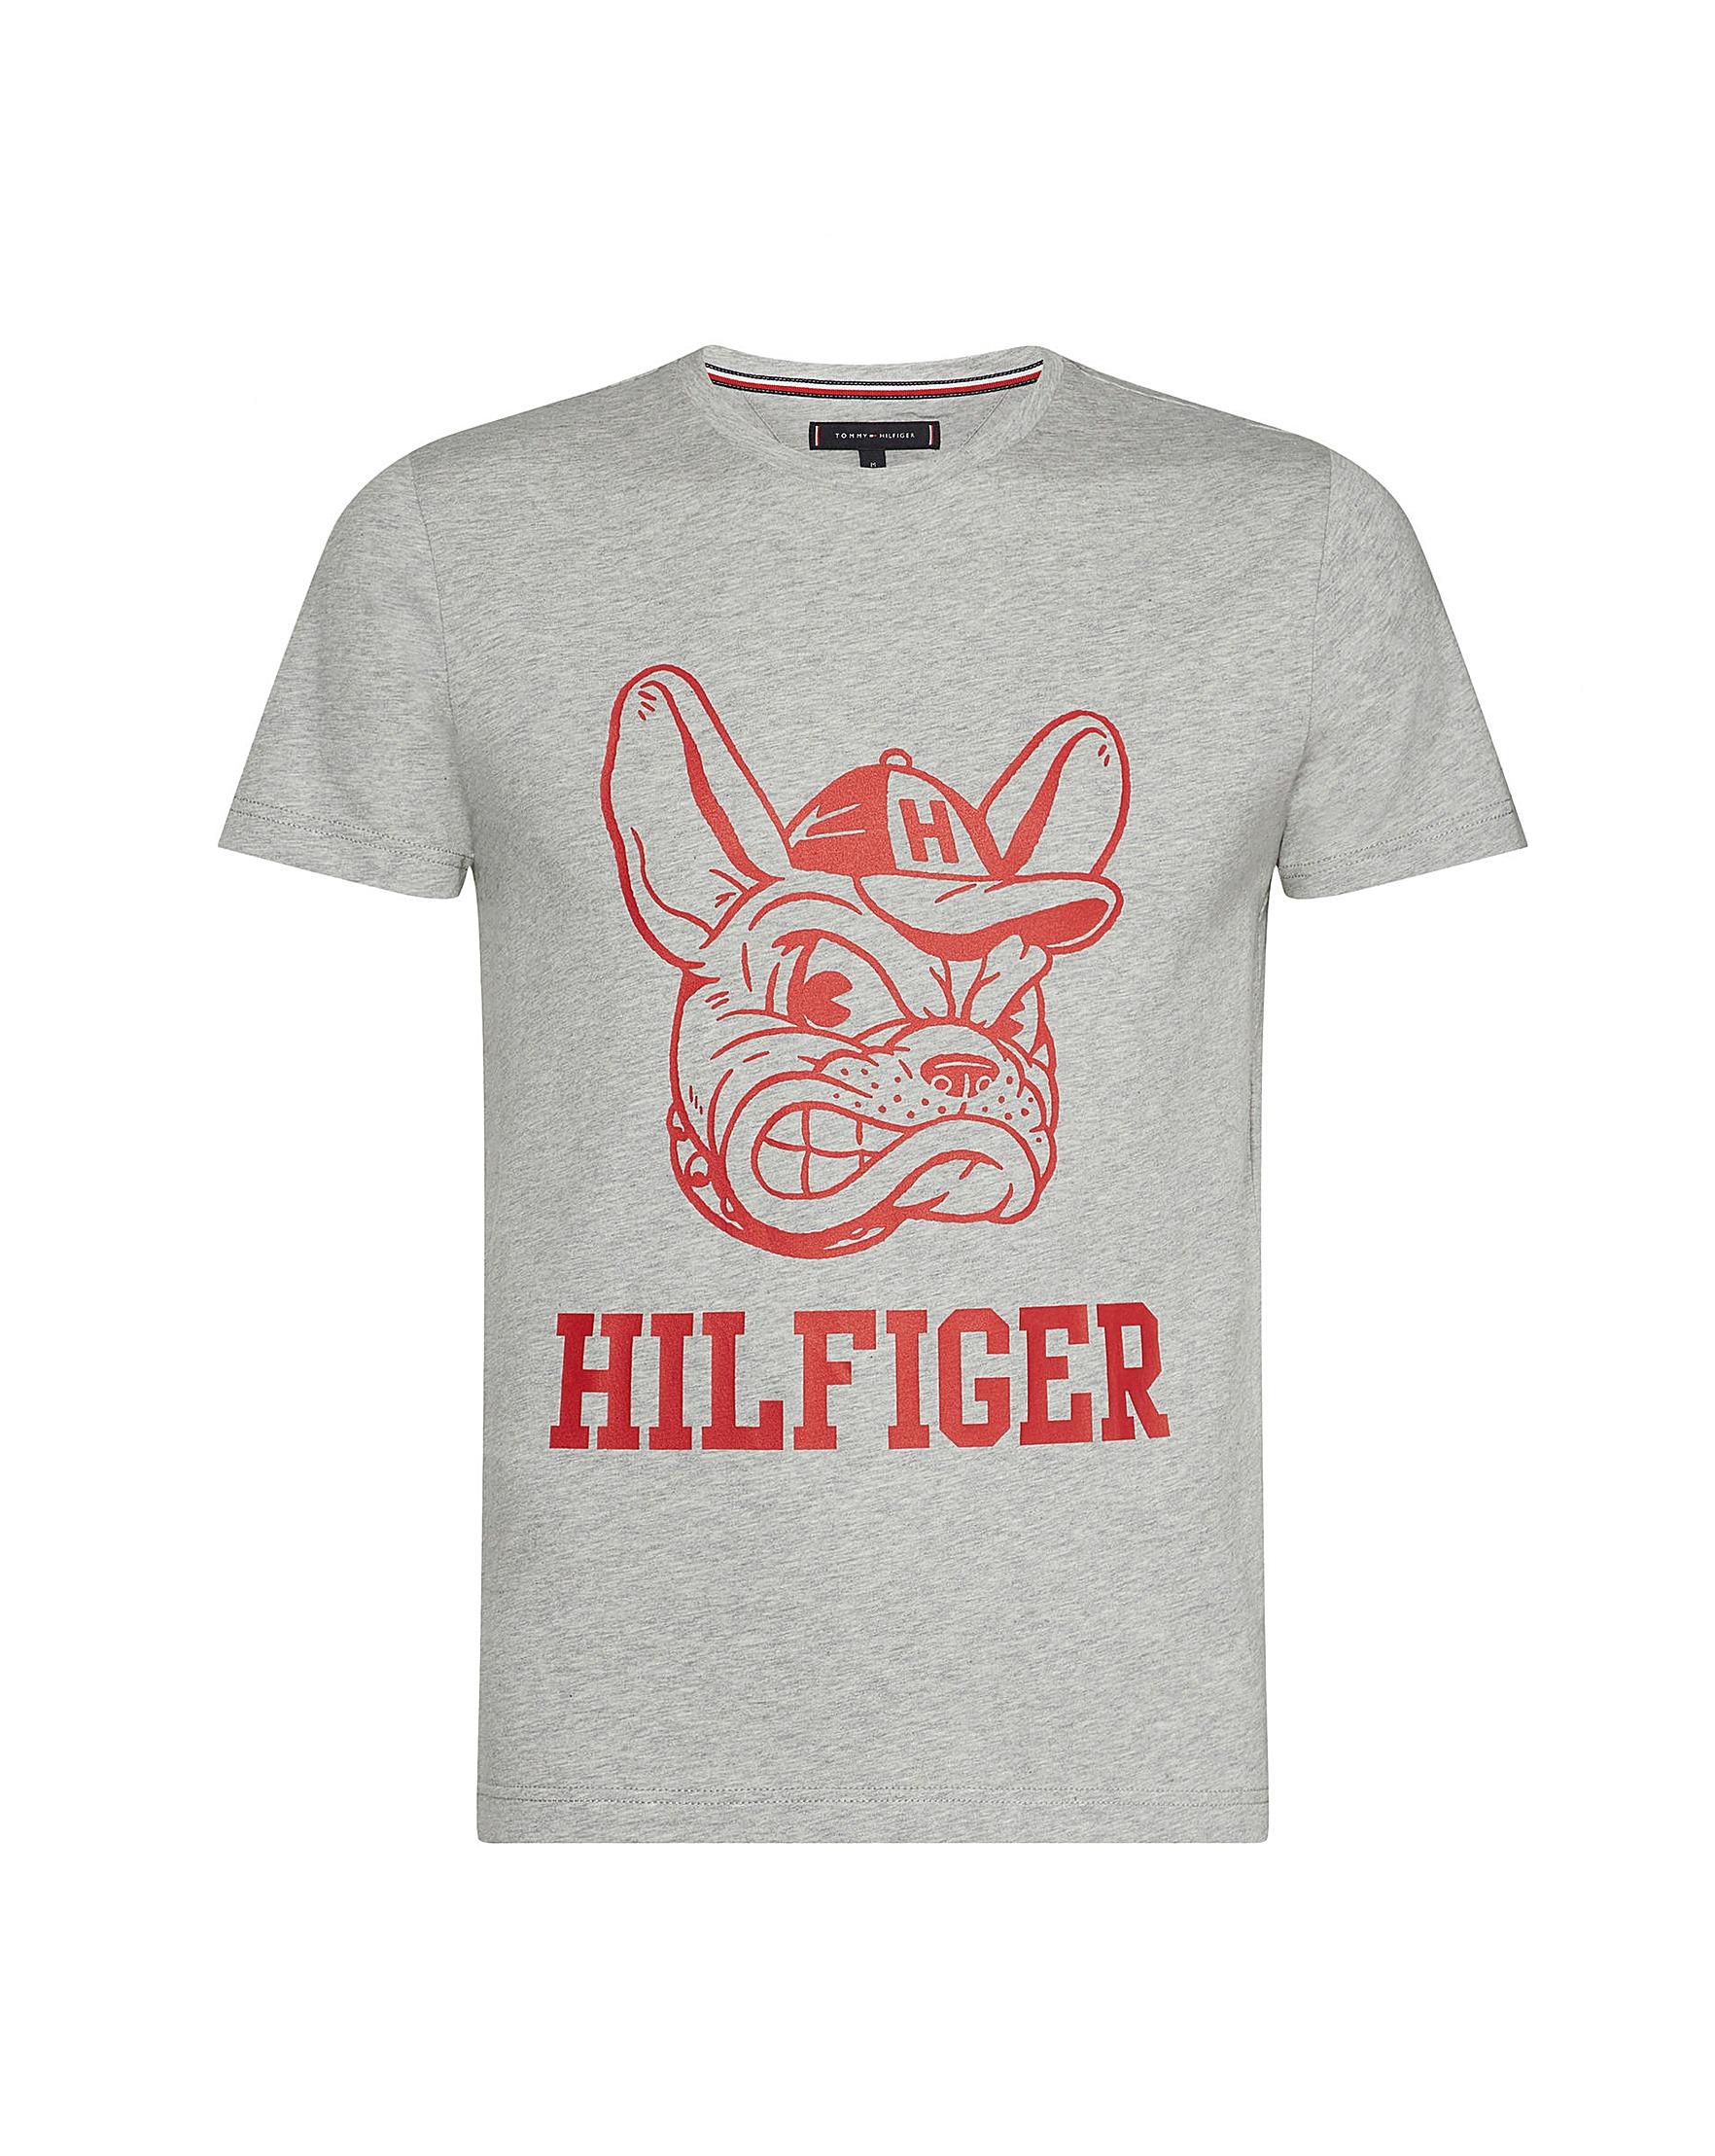 5cba019e6 Tommy Hilfiger Mighty Dog Logo T-Shirt | Jacamo